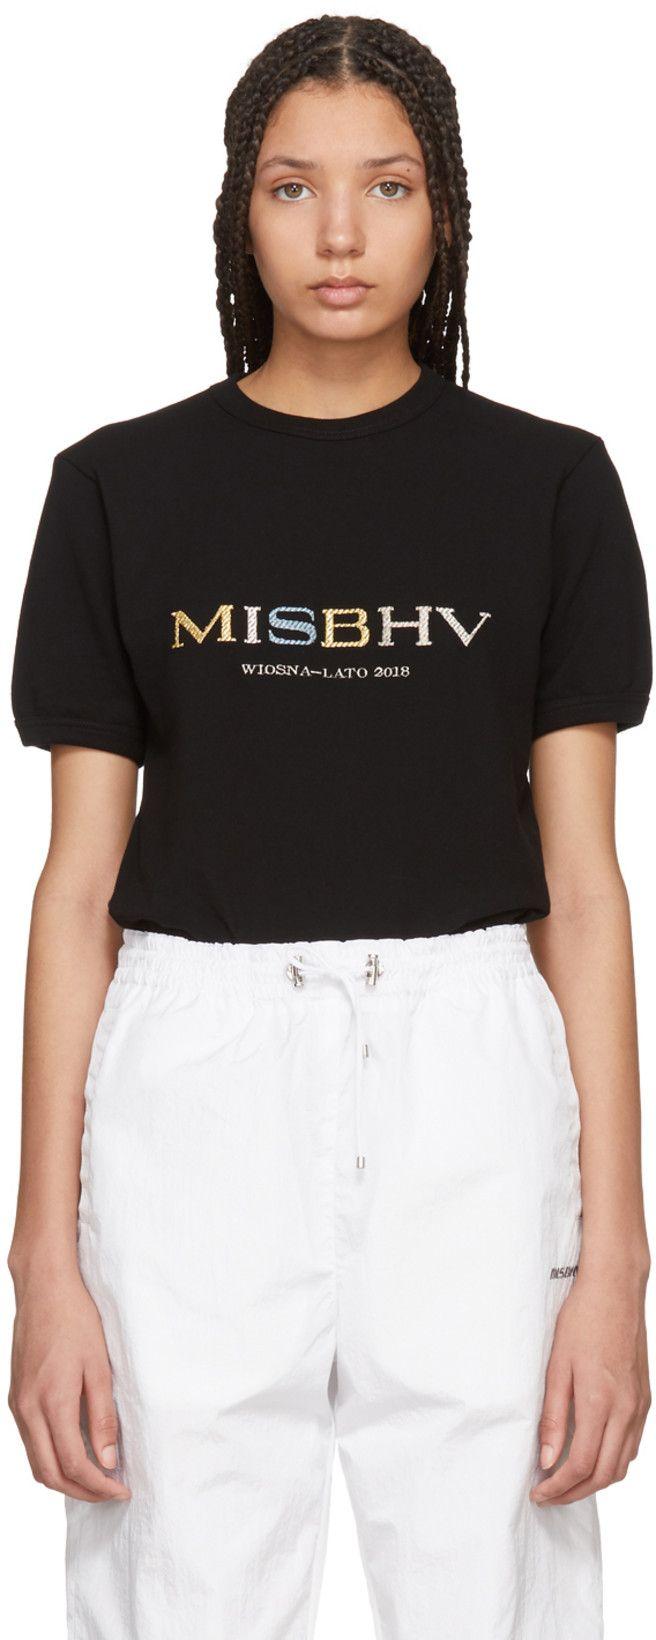 8b798de3 MISBHV - Black Souvenir T-Shirt | ✰fashion killer✰ | Shirts, T ...